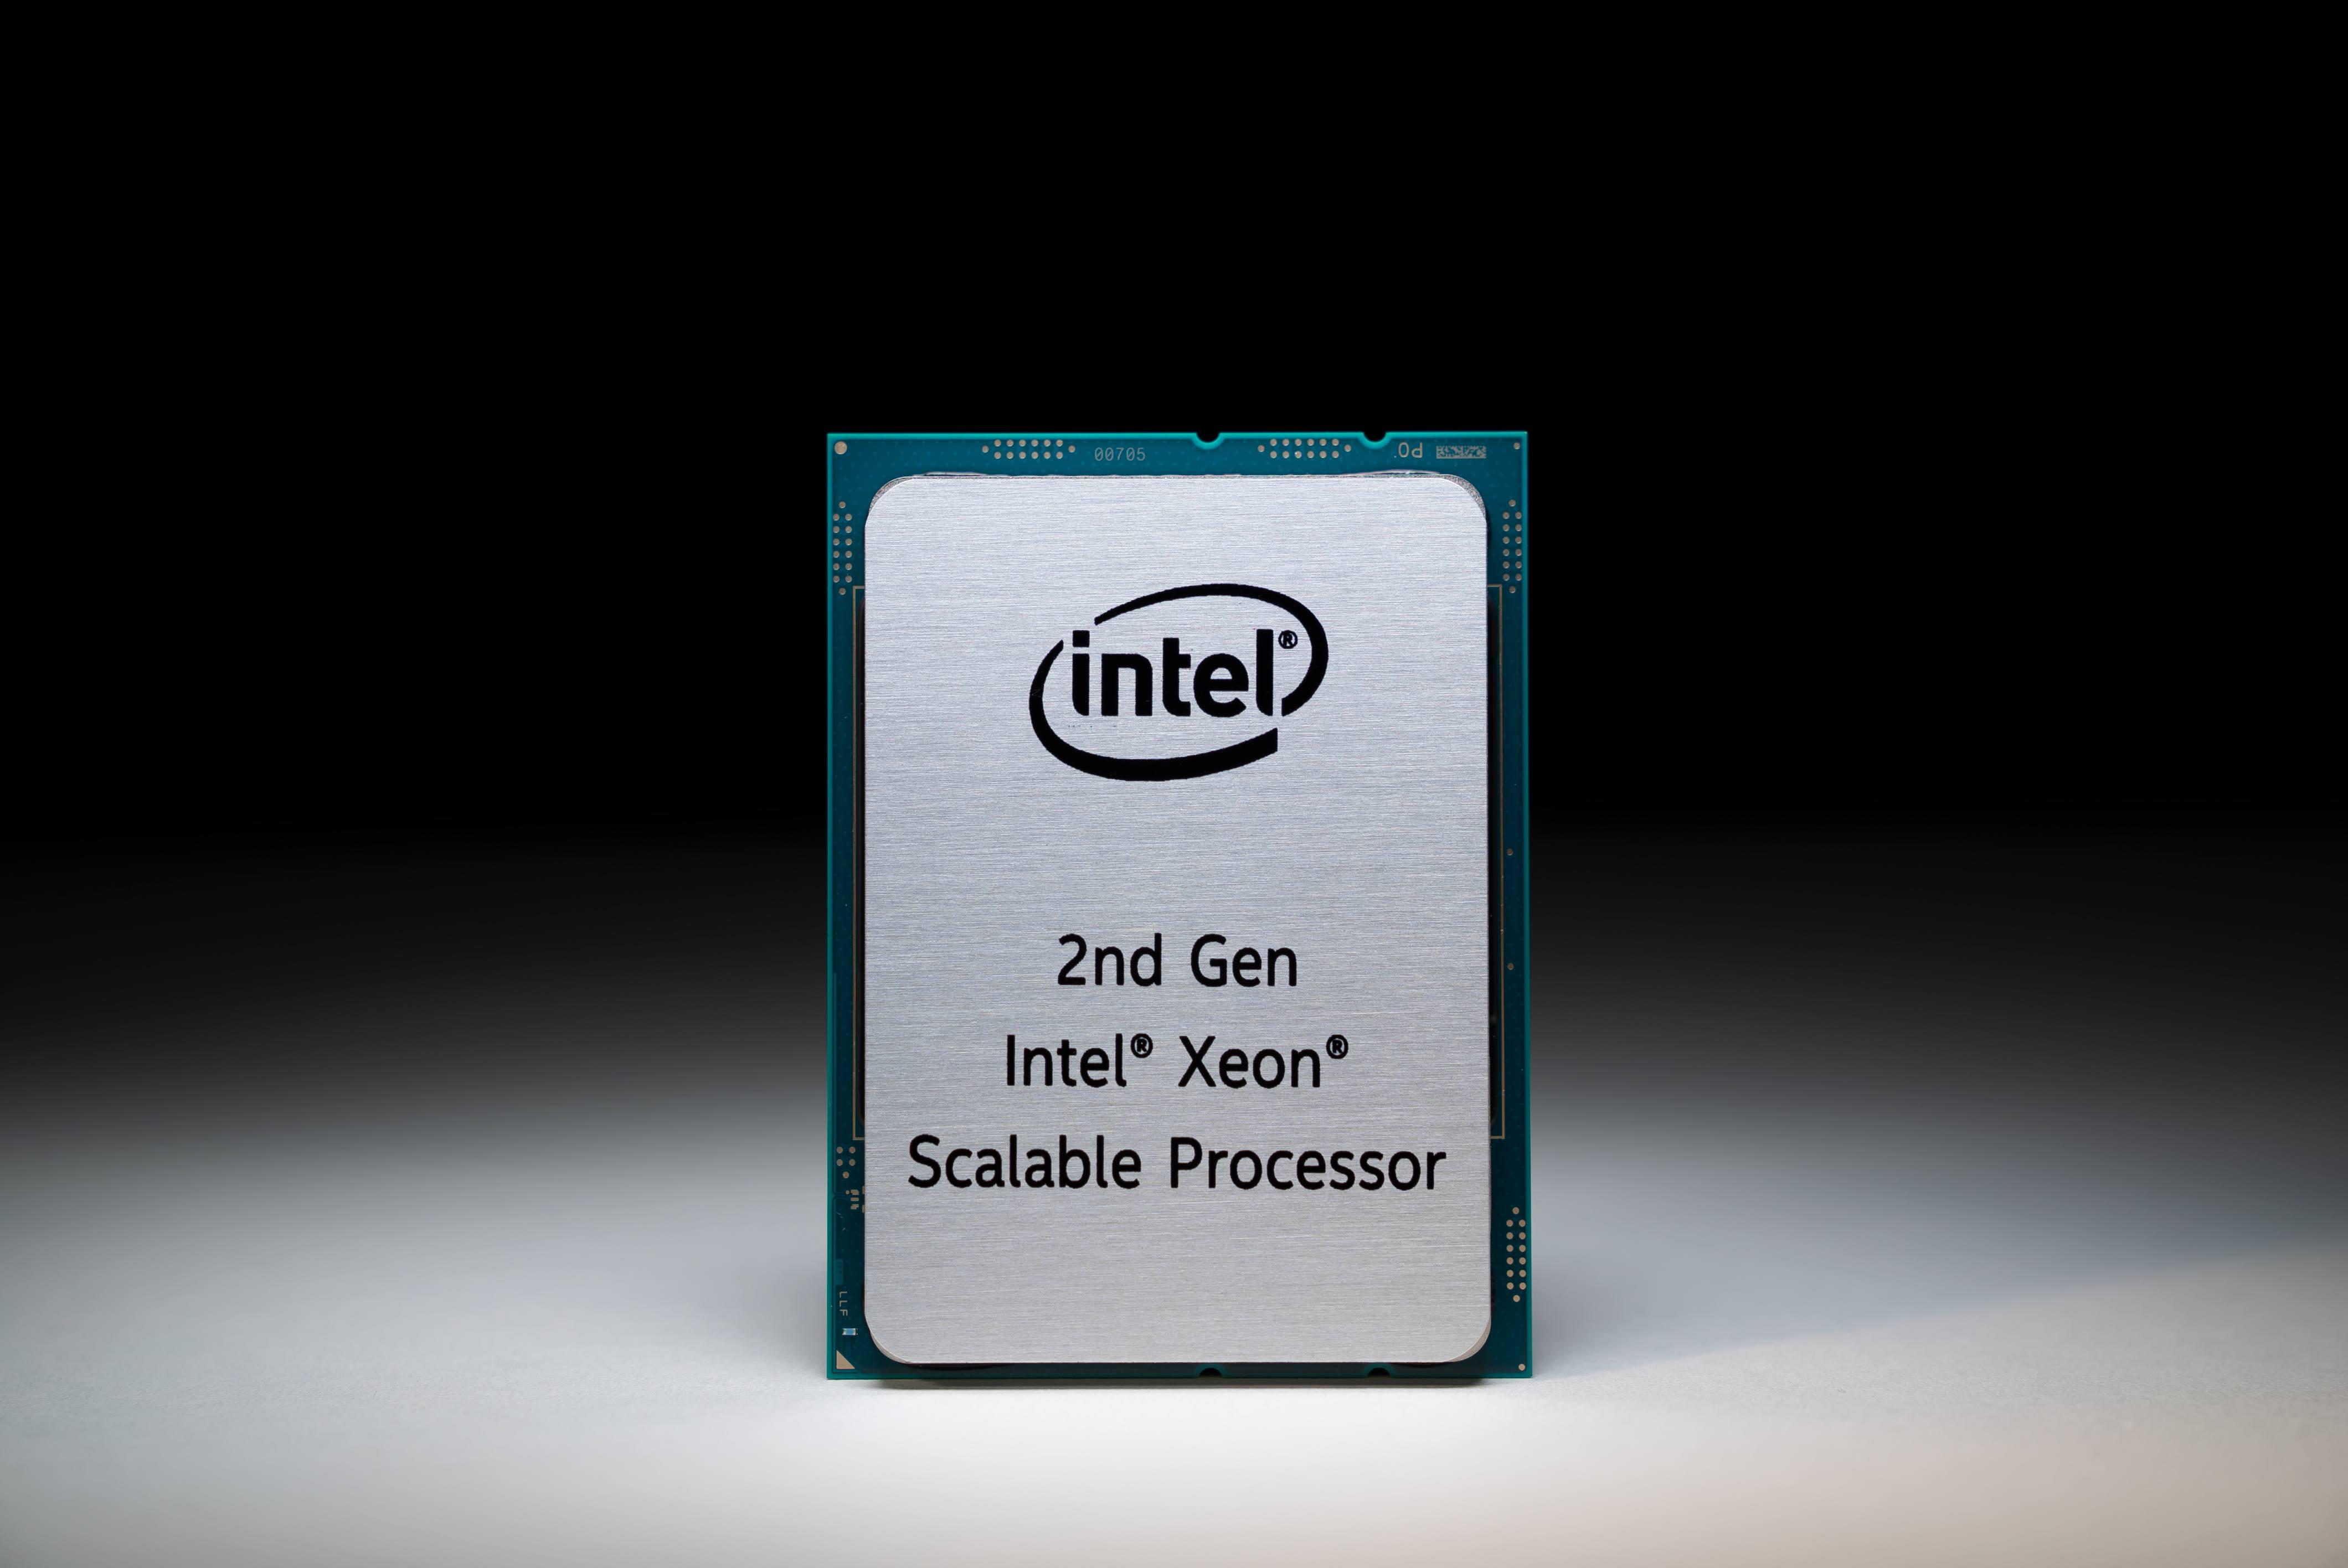 Intel-2nd-Gen-Xeon-Scalable-2